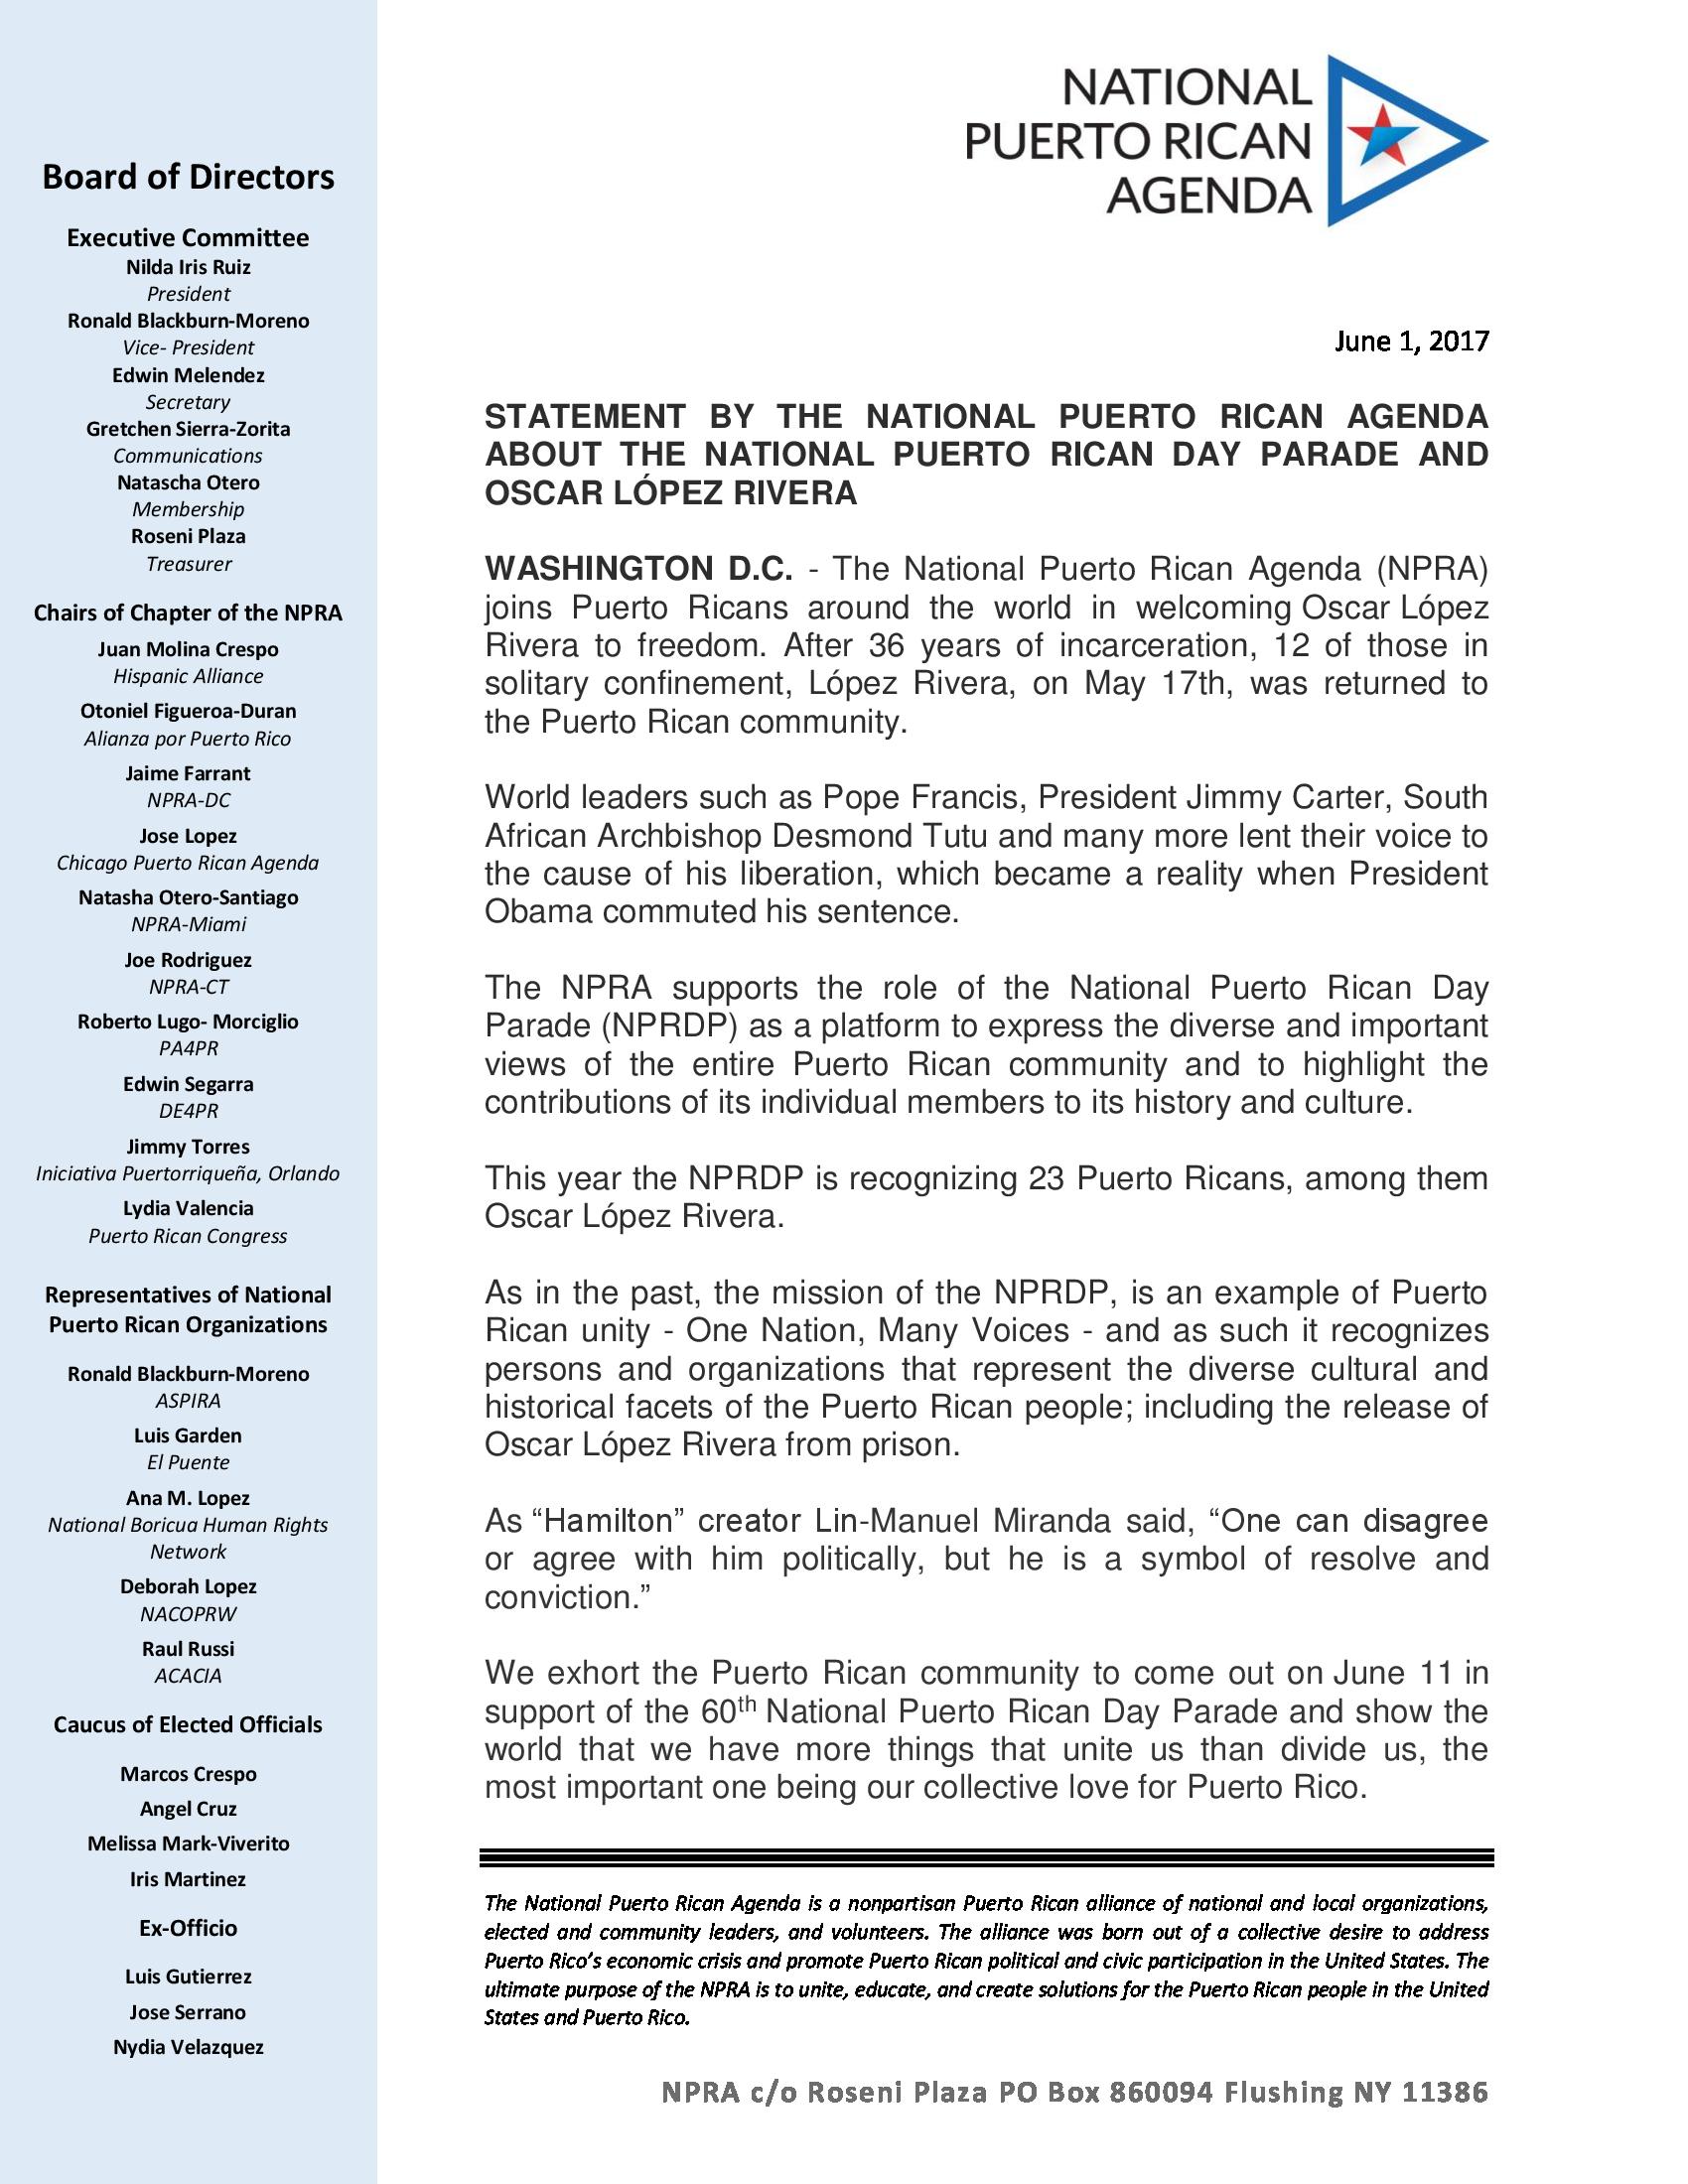 NPRA-Statement-re-NPRDP-and-OLR.jpg